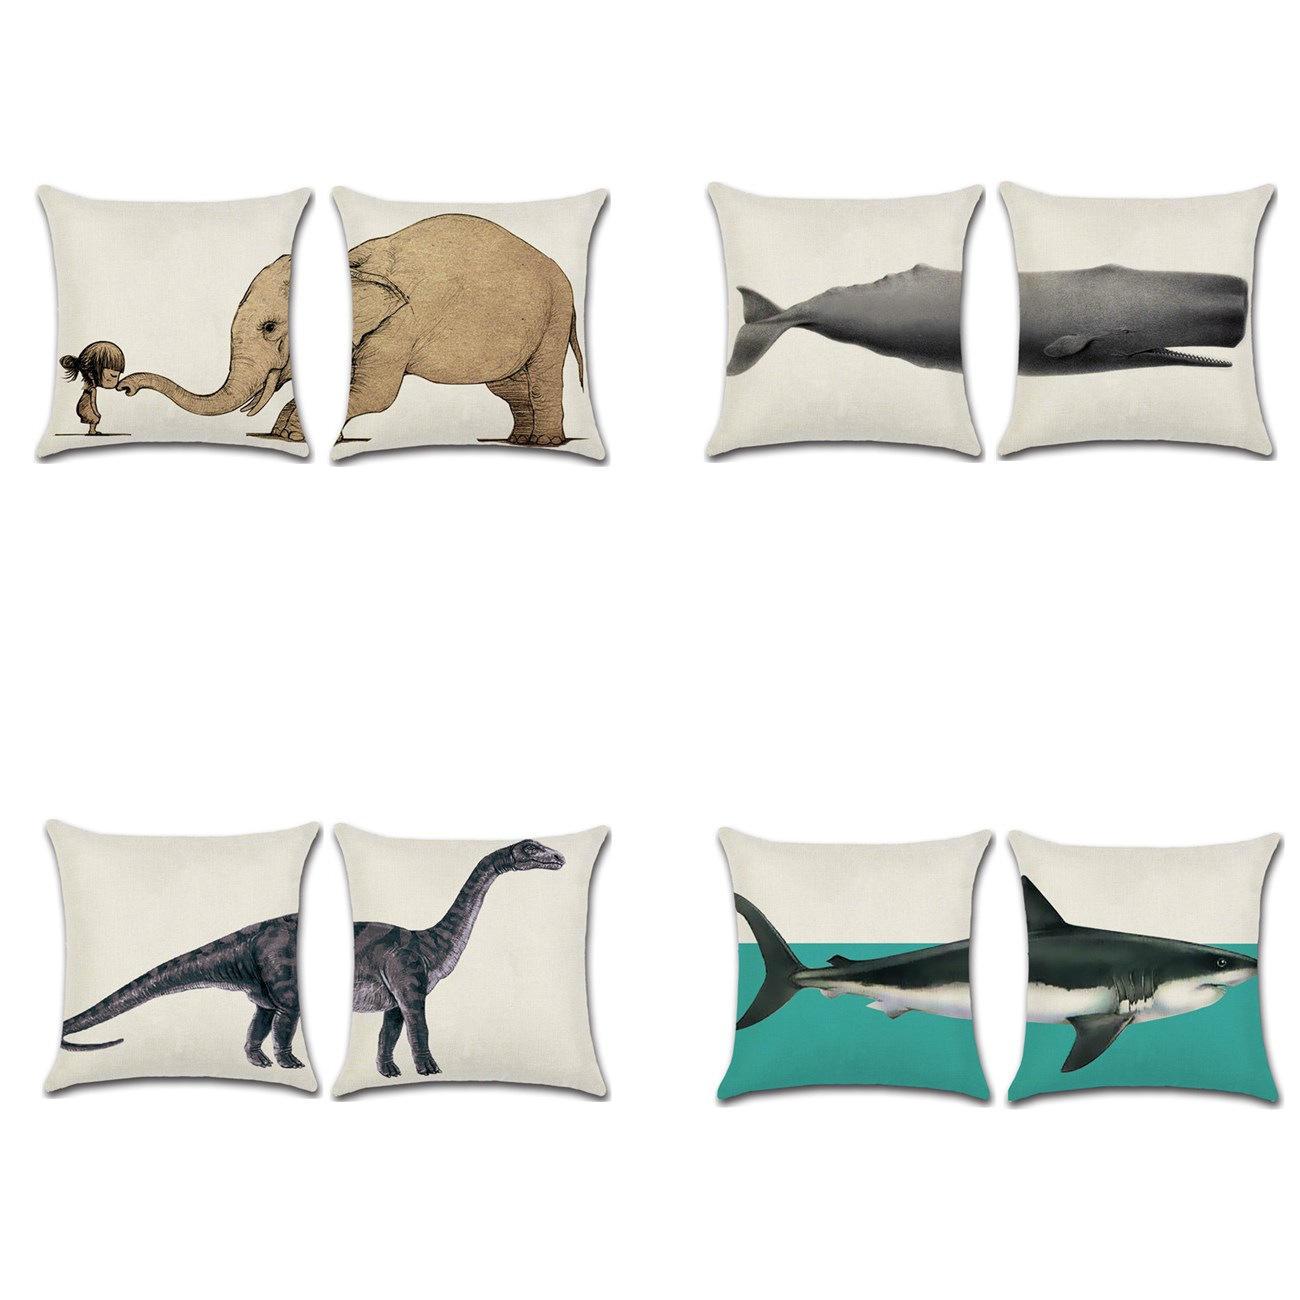 Elephant Shark Whale Dinosaur Cushion Cover Cotton Linen Pillow Case Throw Wedding Decor Pillowcase